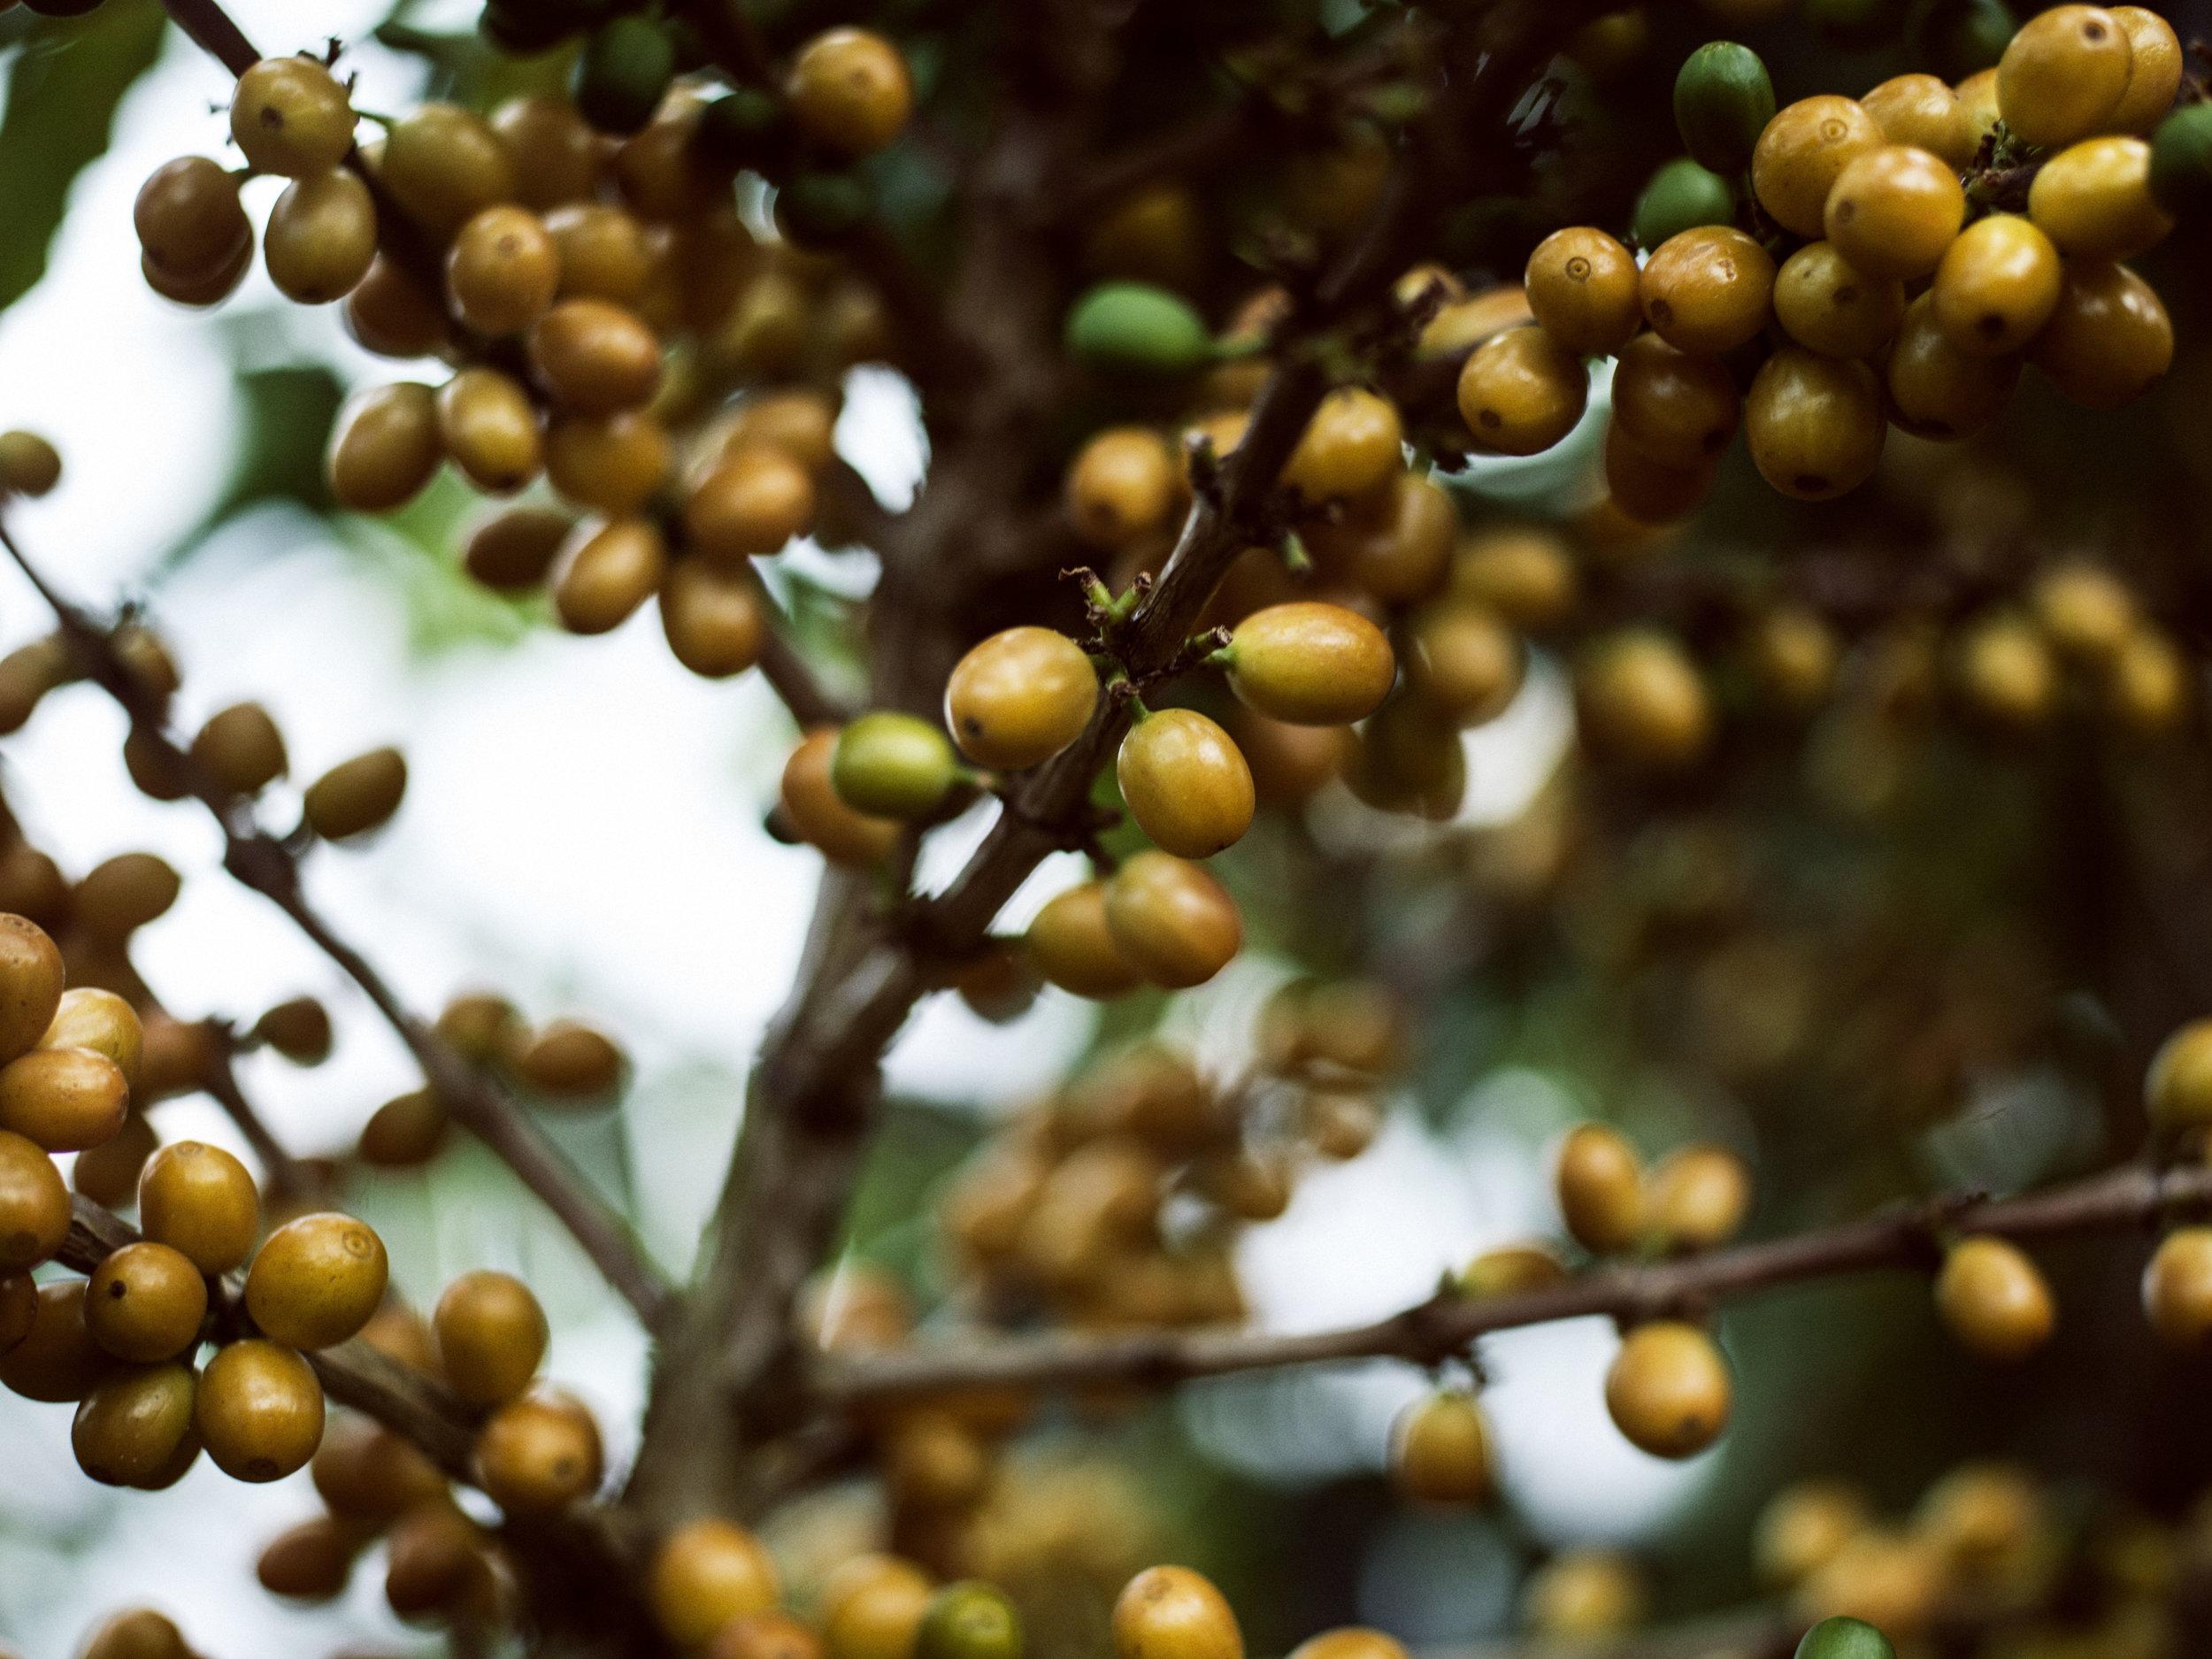 2014_03_08_tk_for_better_coffee_honduras_hasselblad-321_final.jpg